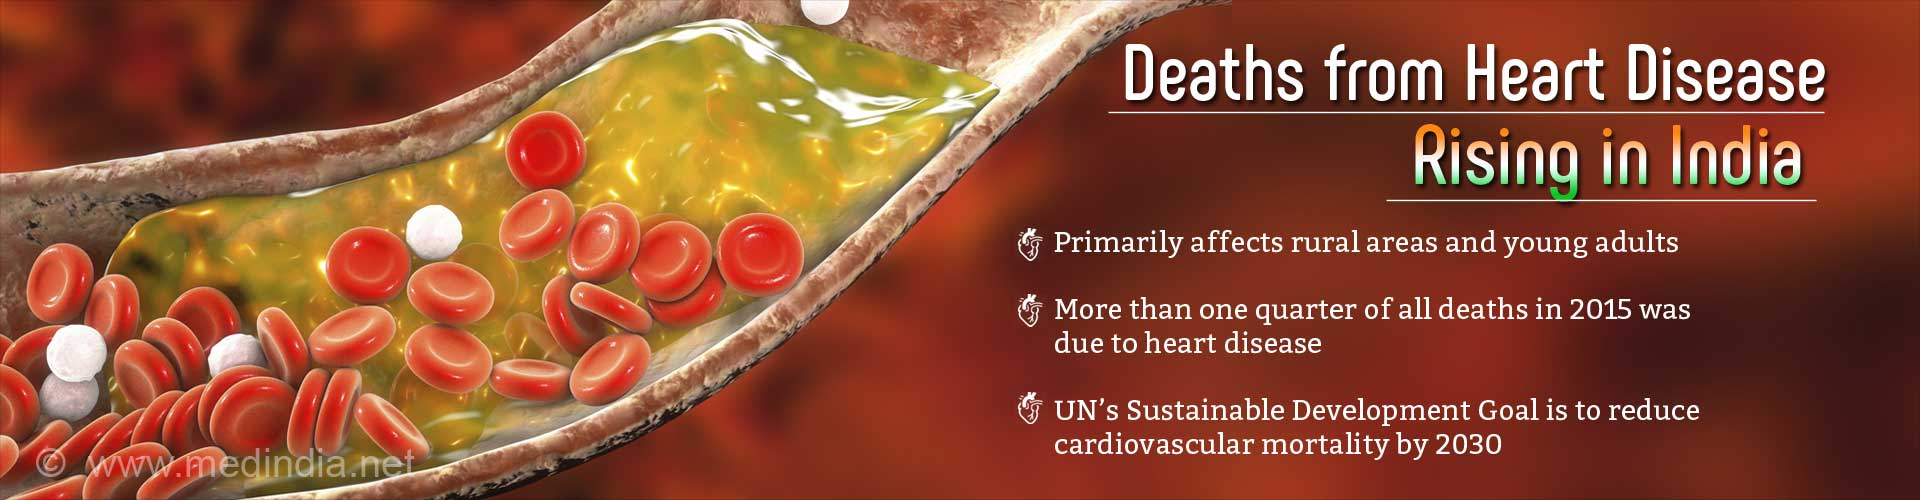 Cardiovascular Disease Deaths Rising in India